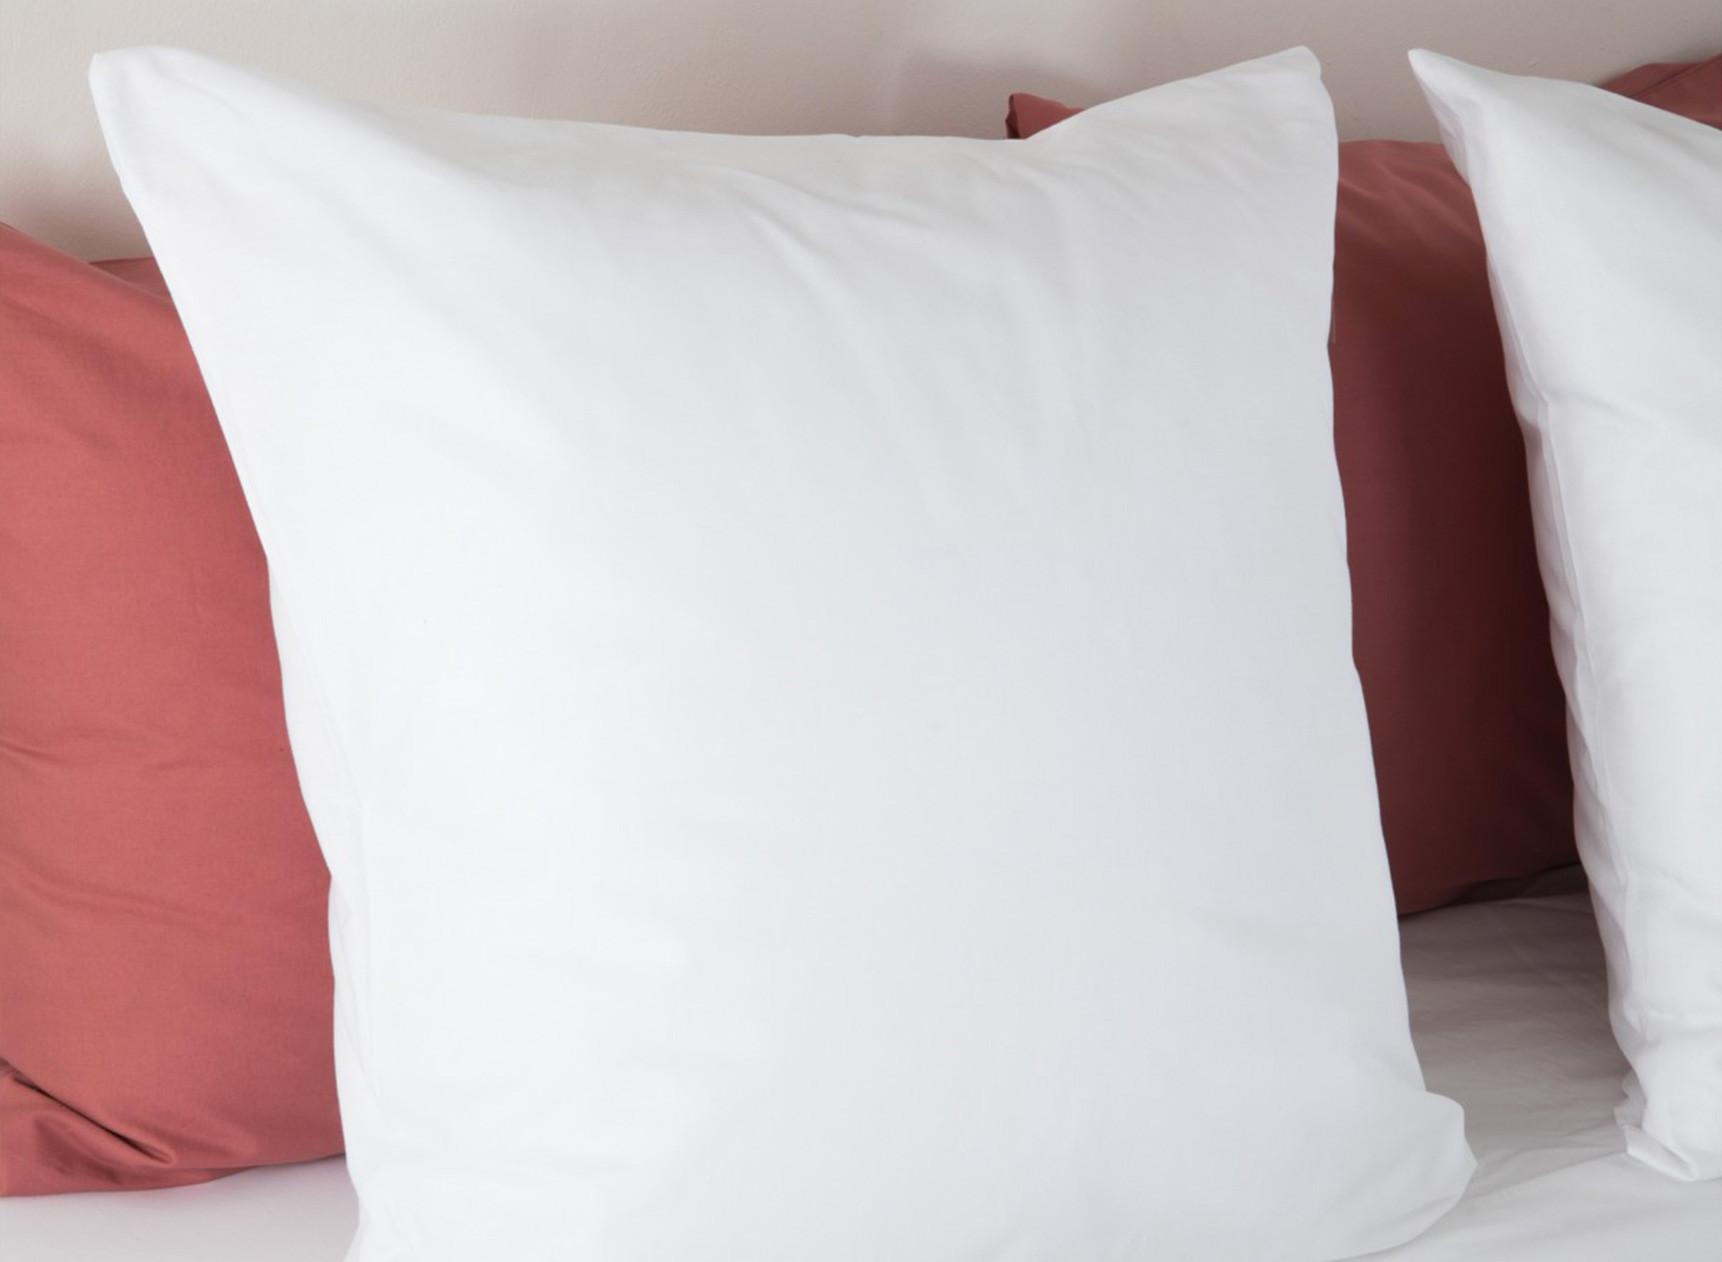 Oreiller confort 60x60cm ANDY Coton Bio Nateo Concept - 1